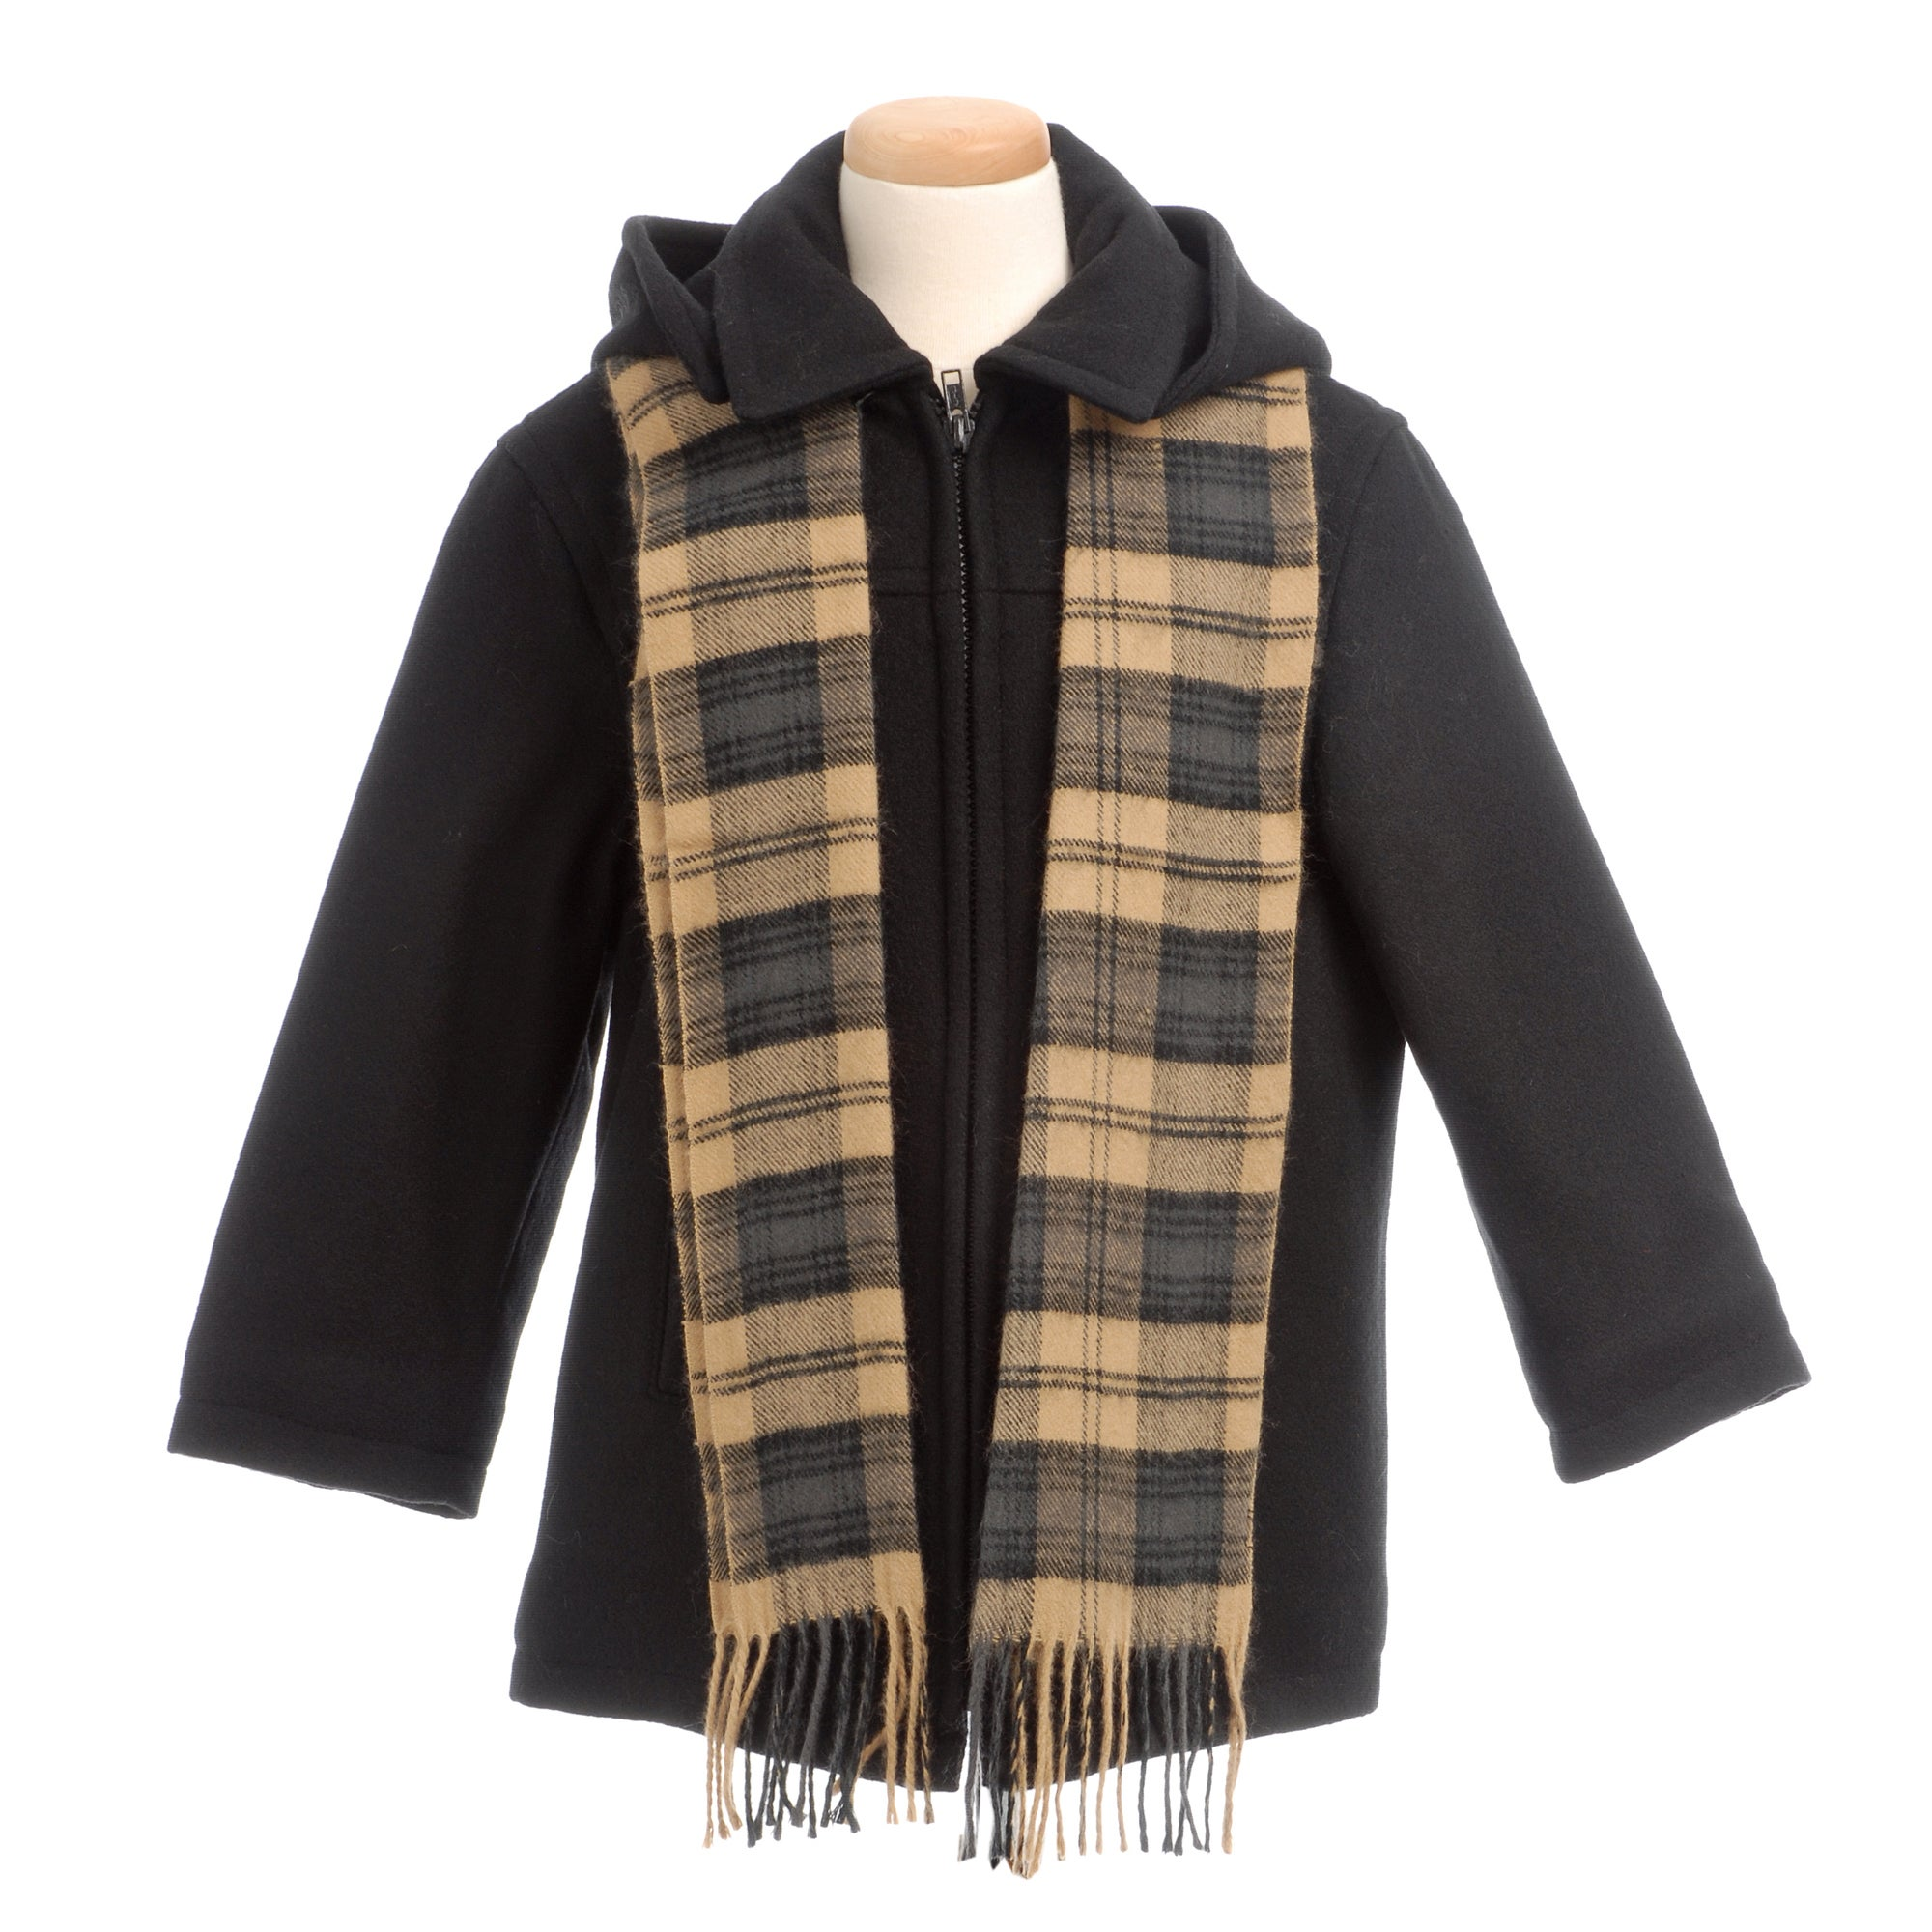 Brian Mathews Boy's Charcoal Wool-blend Jacket